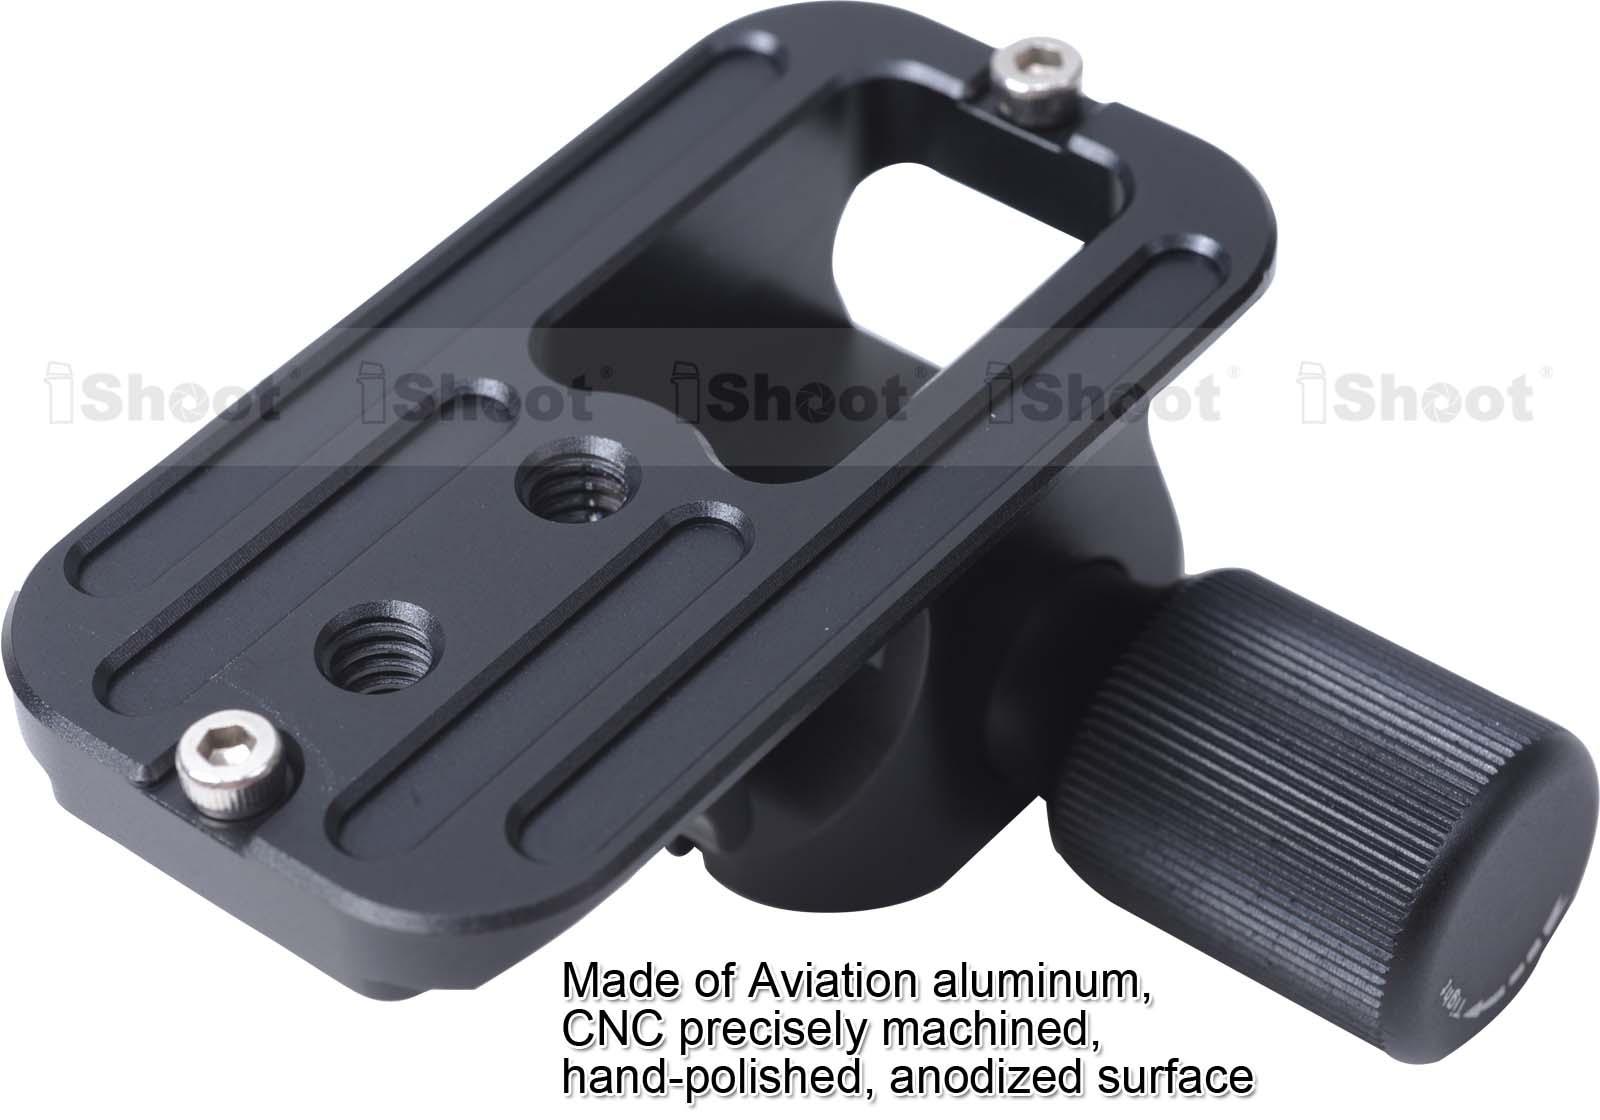 Запасная подставка для штатива для объектива Nikon AF-S Nikkor 70-200 мм f/2,8G ED VR и Nikkor 70-200 мм f/2,8G ED VR II